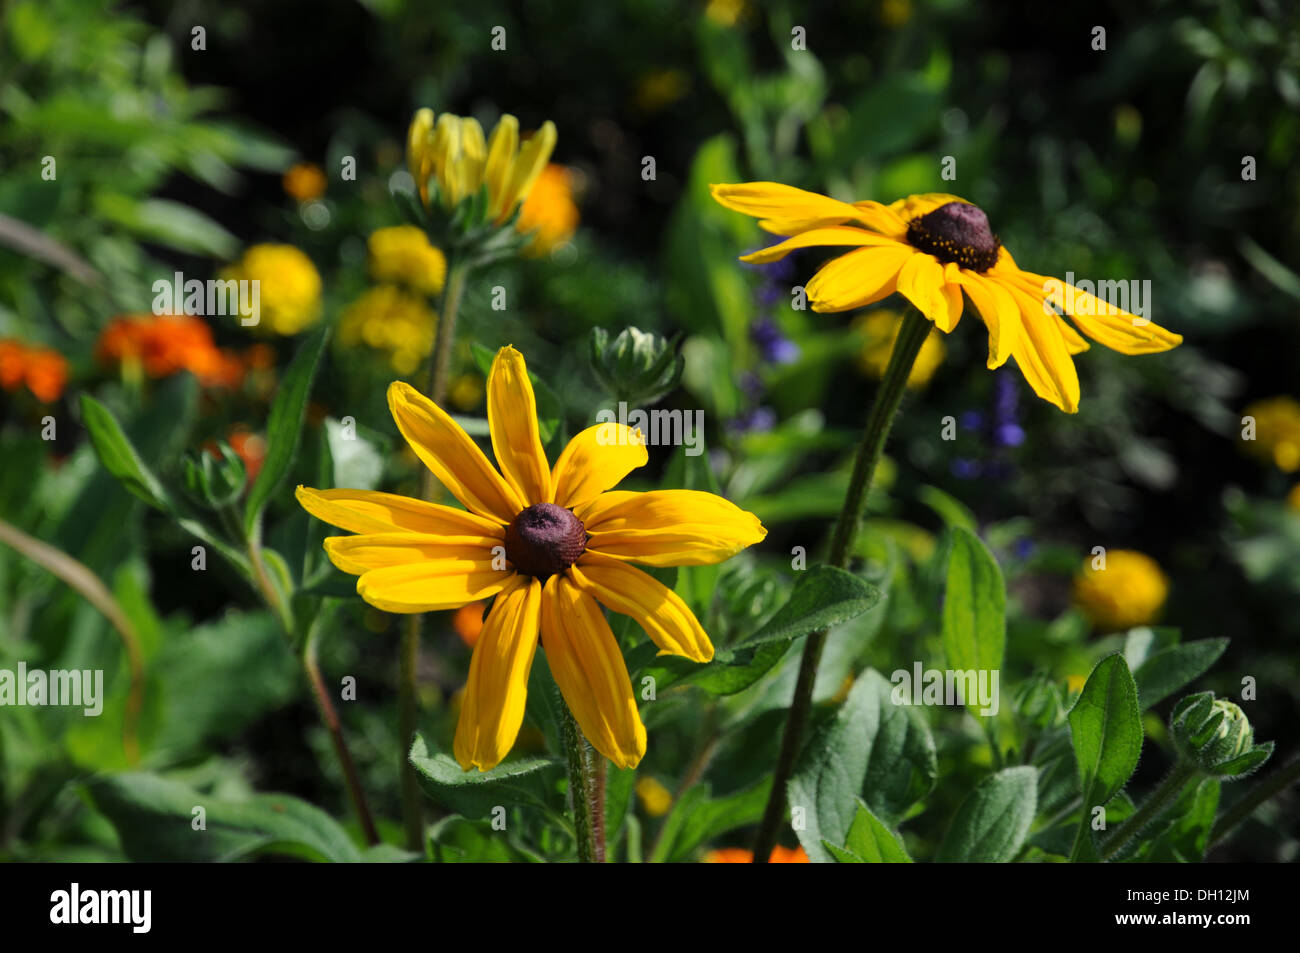 Coneflowers - Stock Image